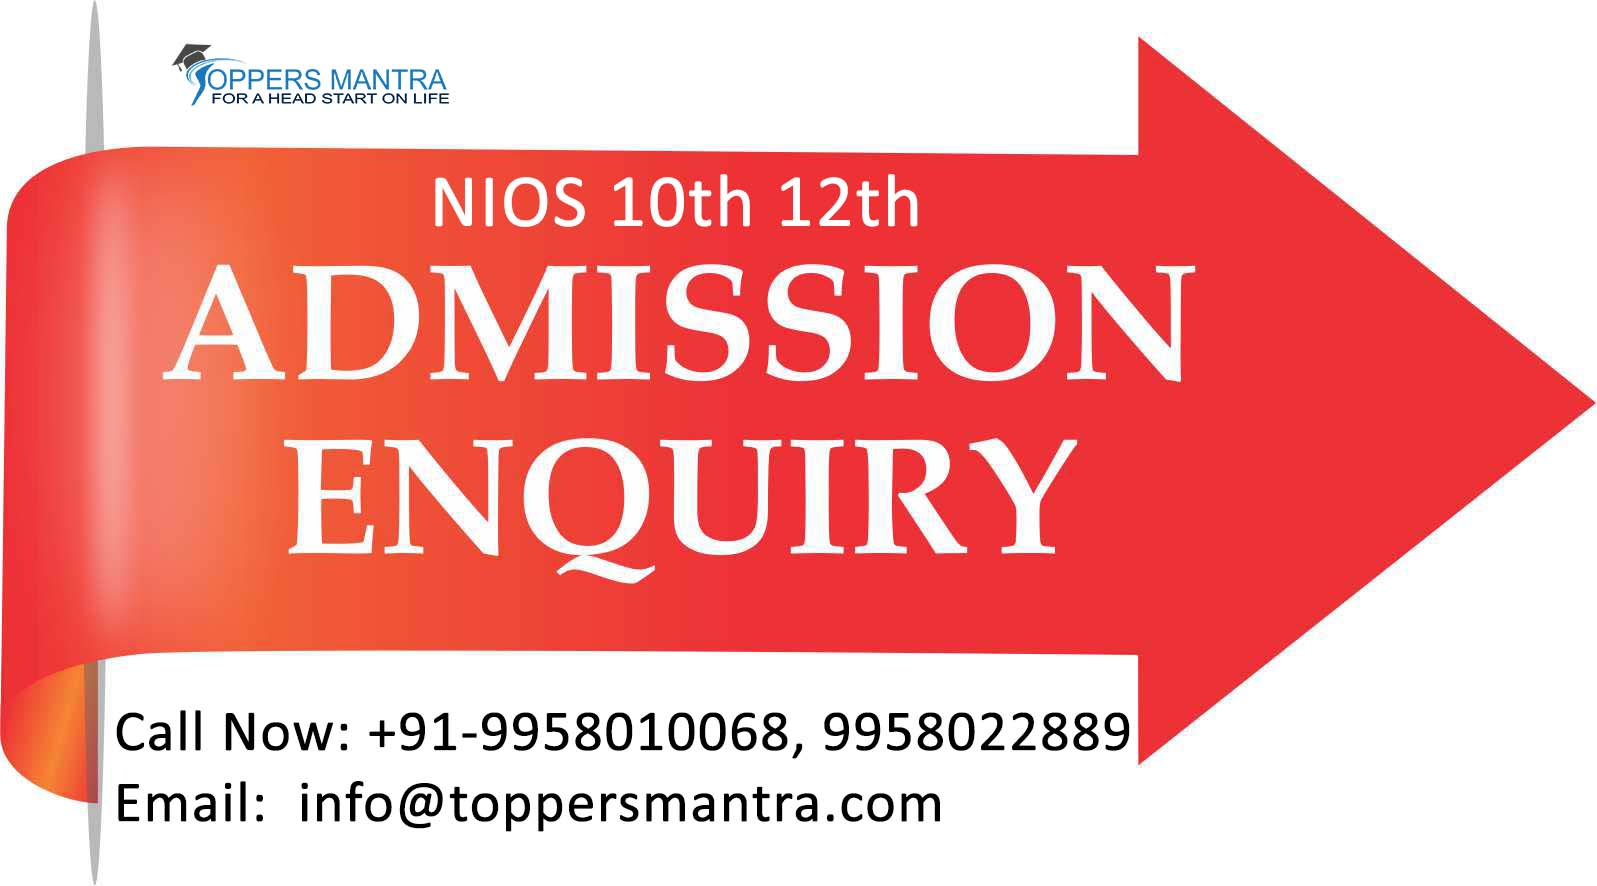 NIOS 10th & 12th Admission 2019-2020